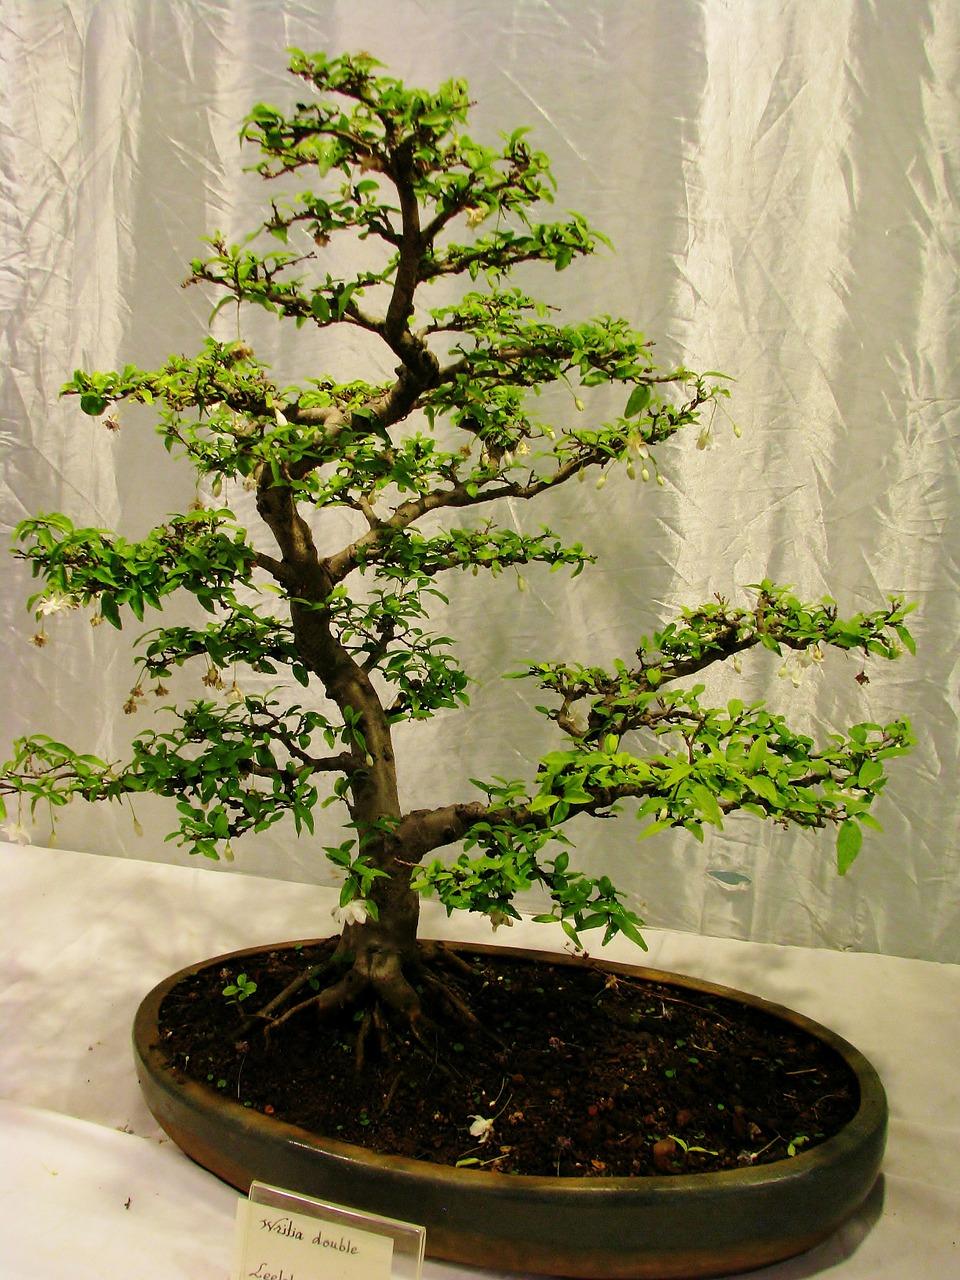 bonsai-tree-390754_1280.jpg